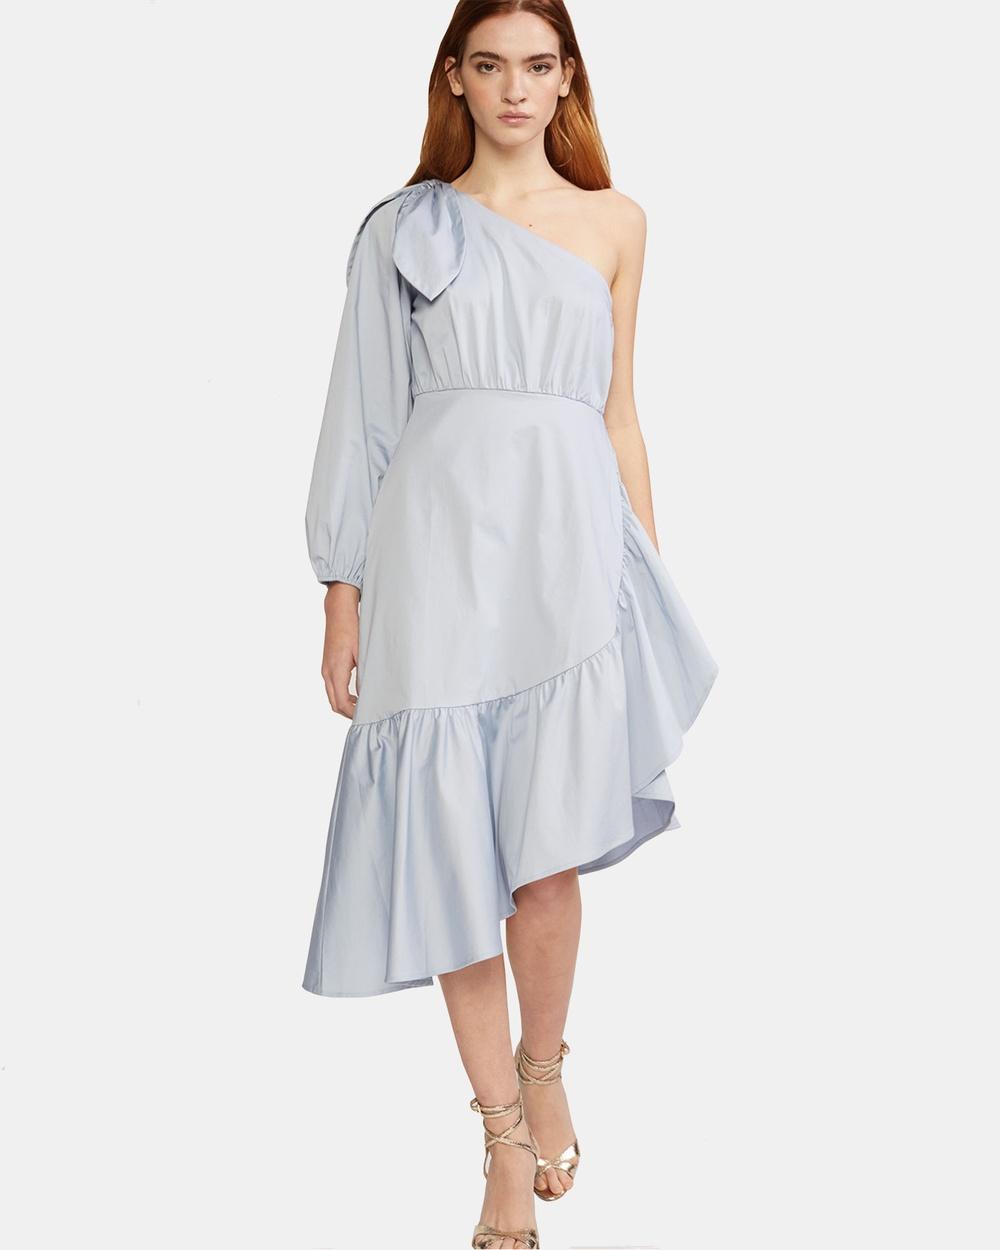 Cynthia Rowley Aleeza One Sleeve Dress Dresses Blue Aleeza One Sleeve Dress